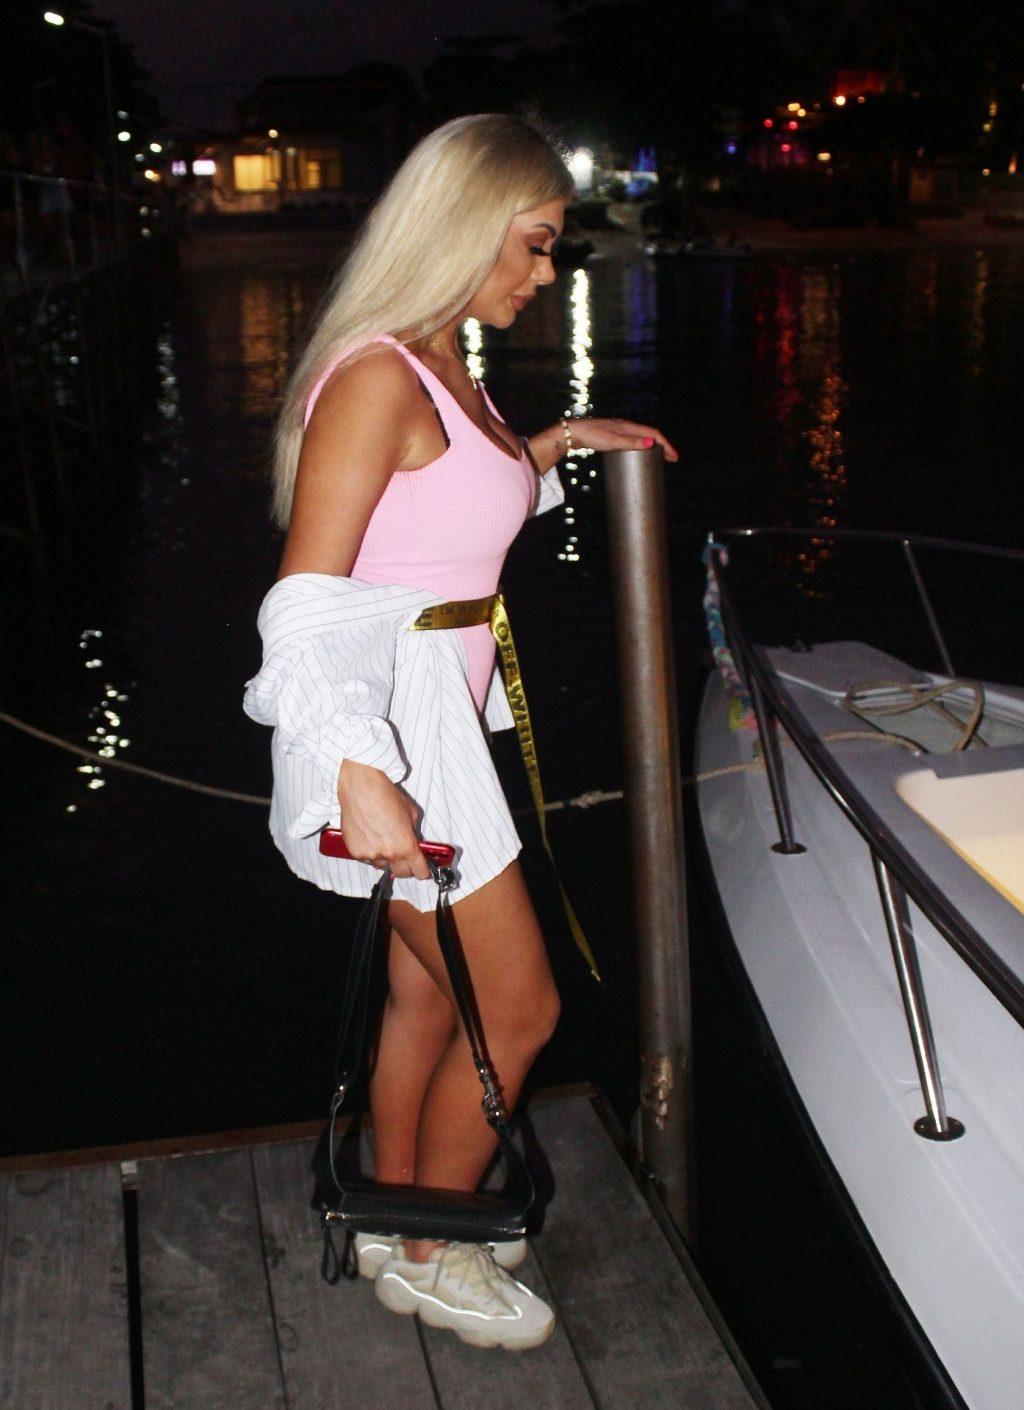 Chloe Ferry Sexy (32 Photos)